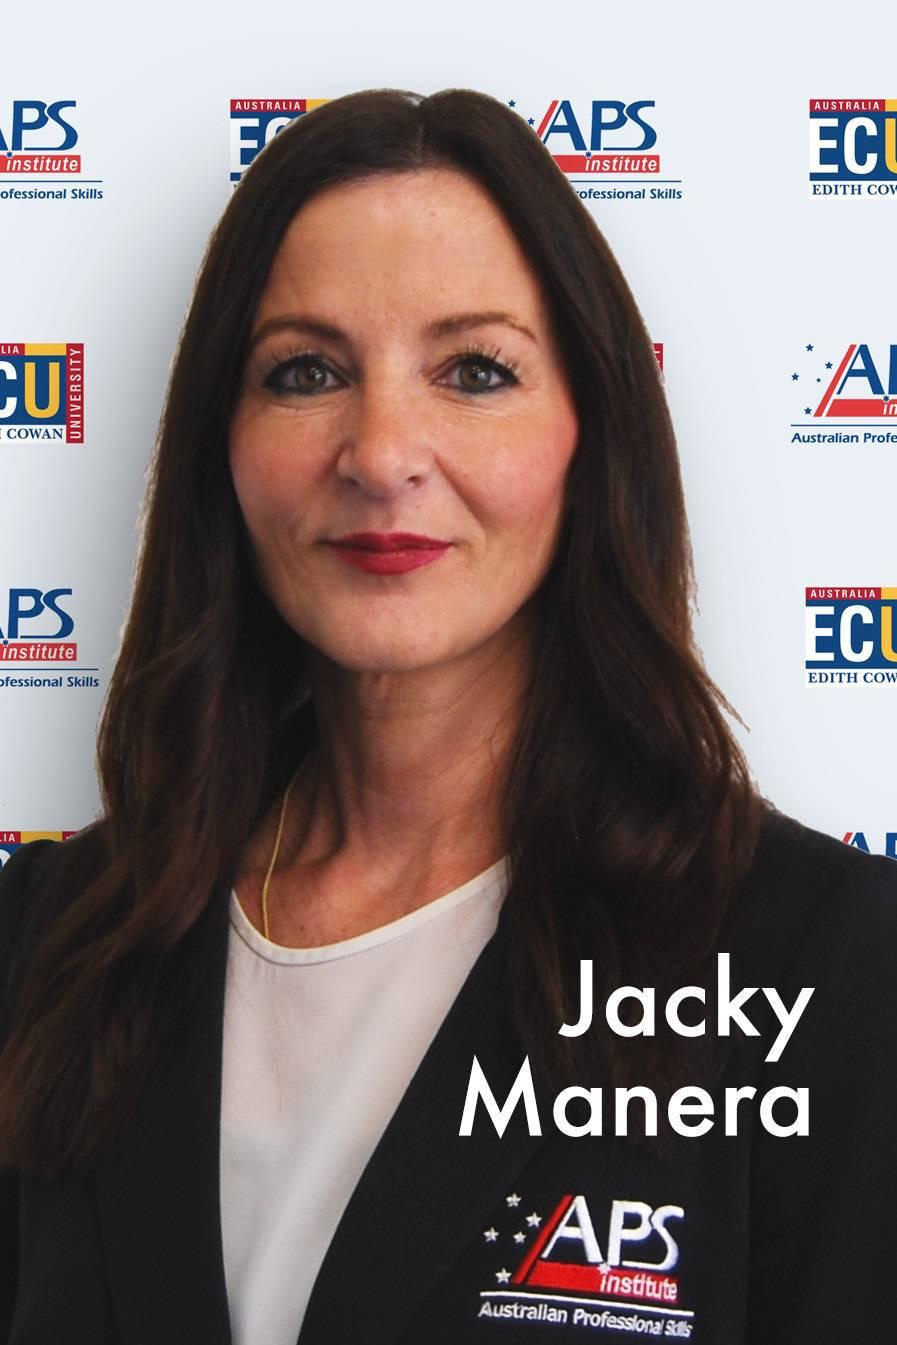 Jacky Manera